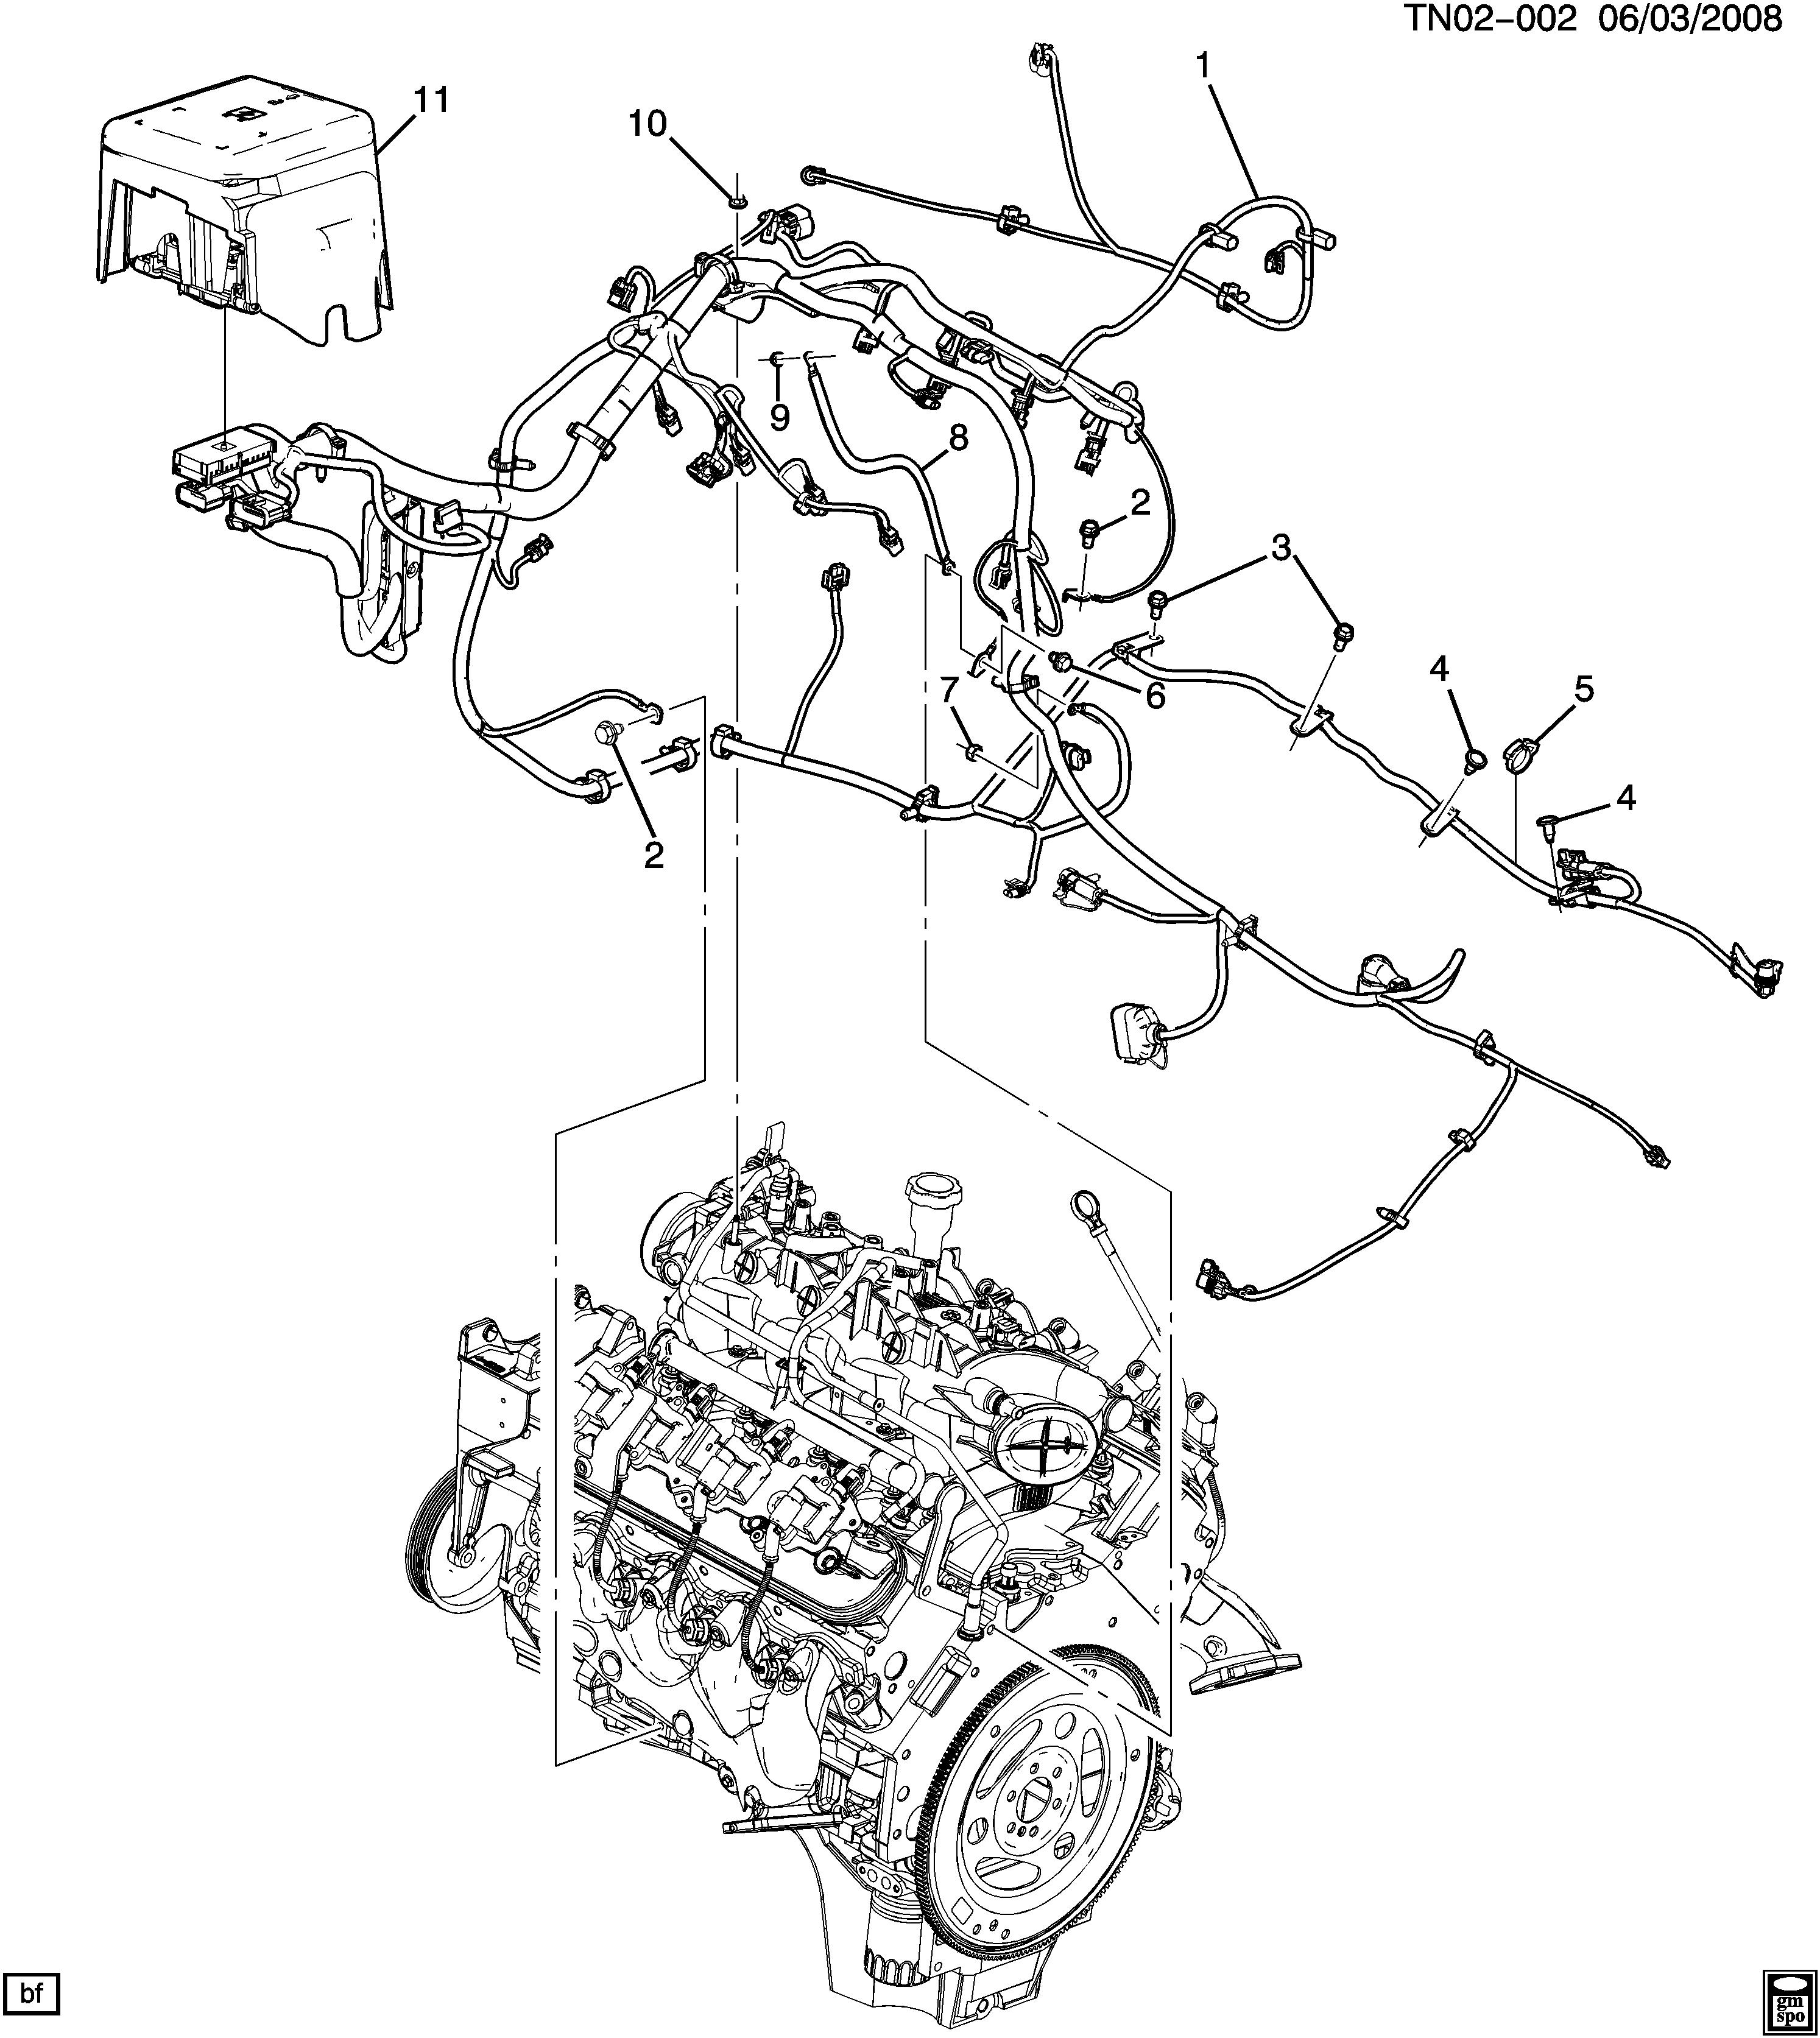 hummer h2 n2 wiring harness engine (lq4 6 0u) \u003e epc online LQ4 Firing Order